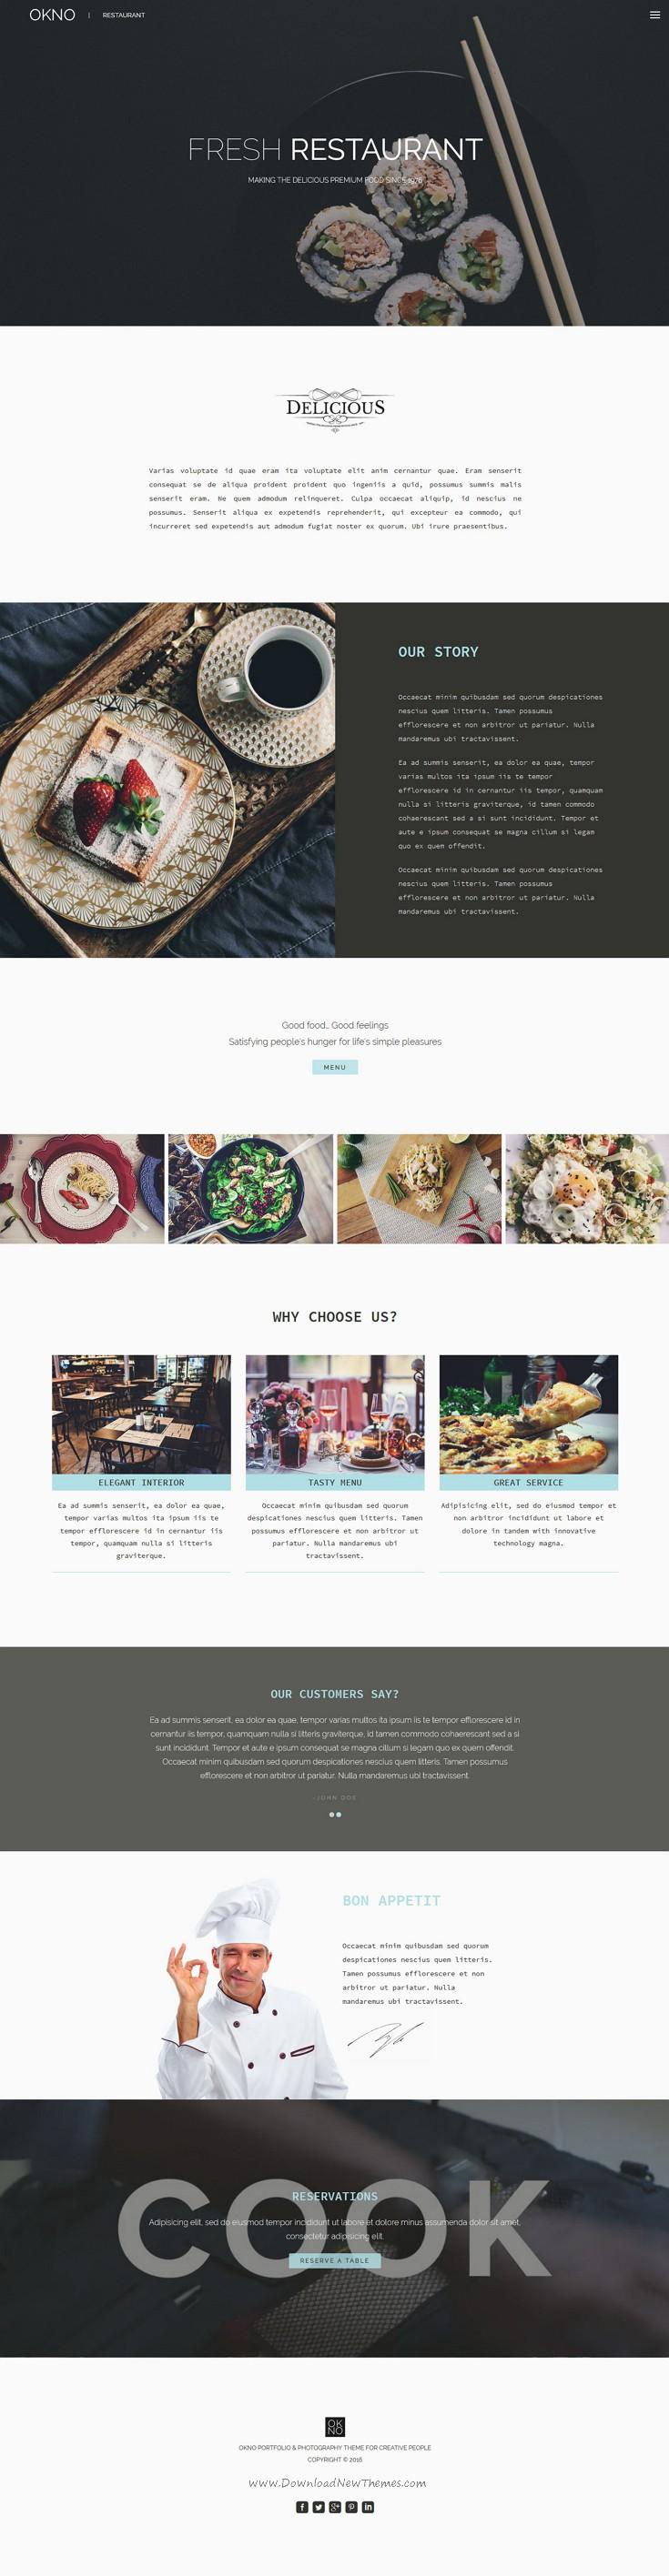 OKNO: Responsive Multipurpose HTML5 Template | Template